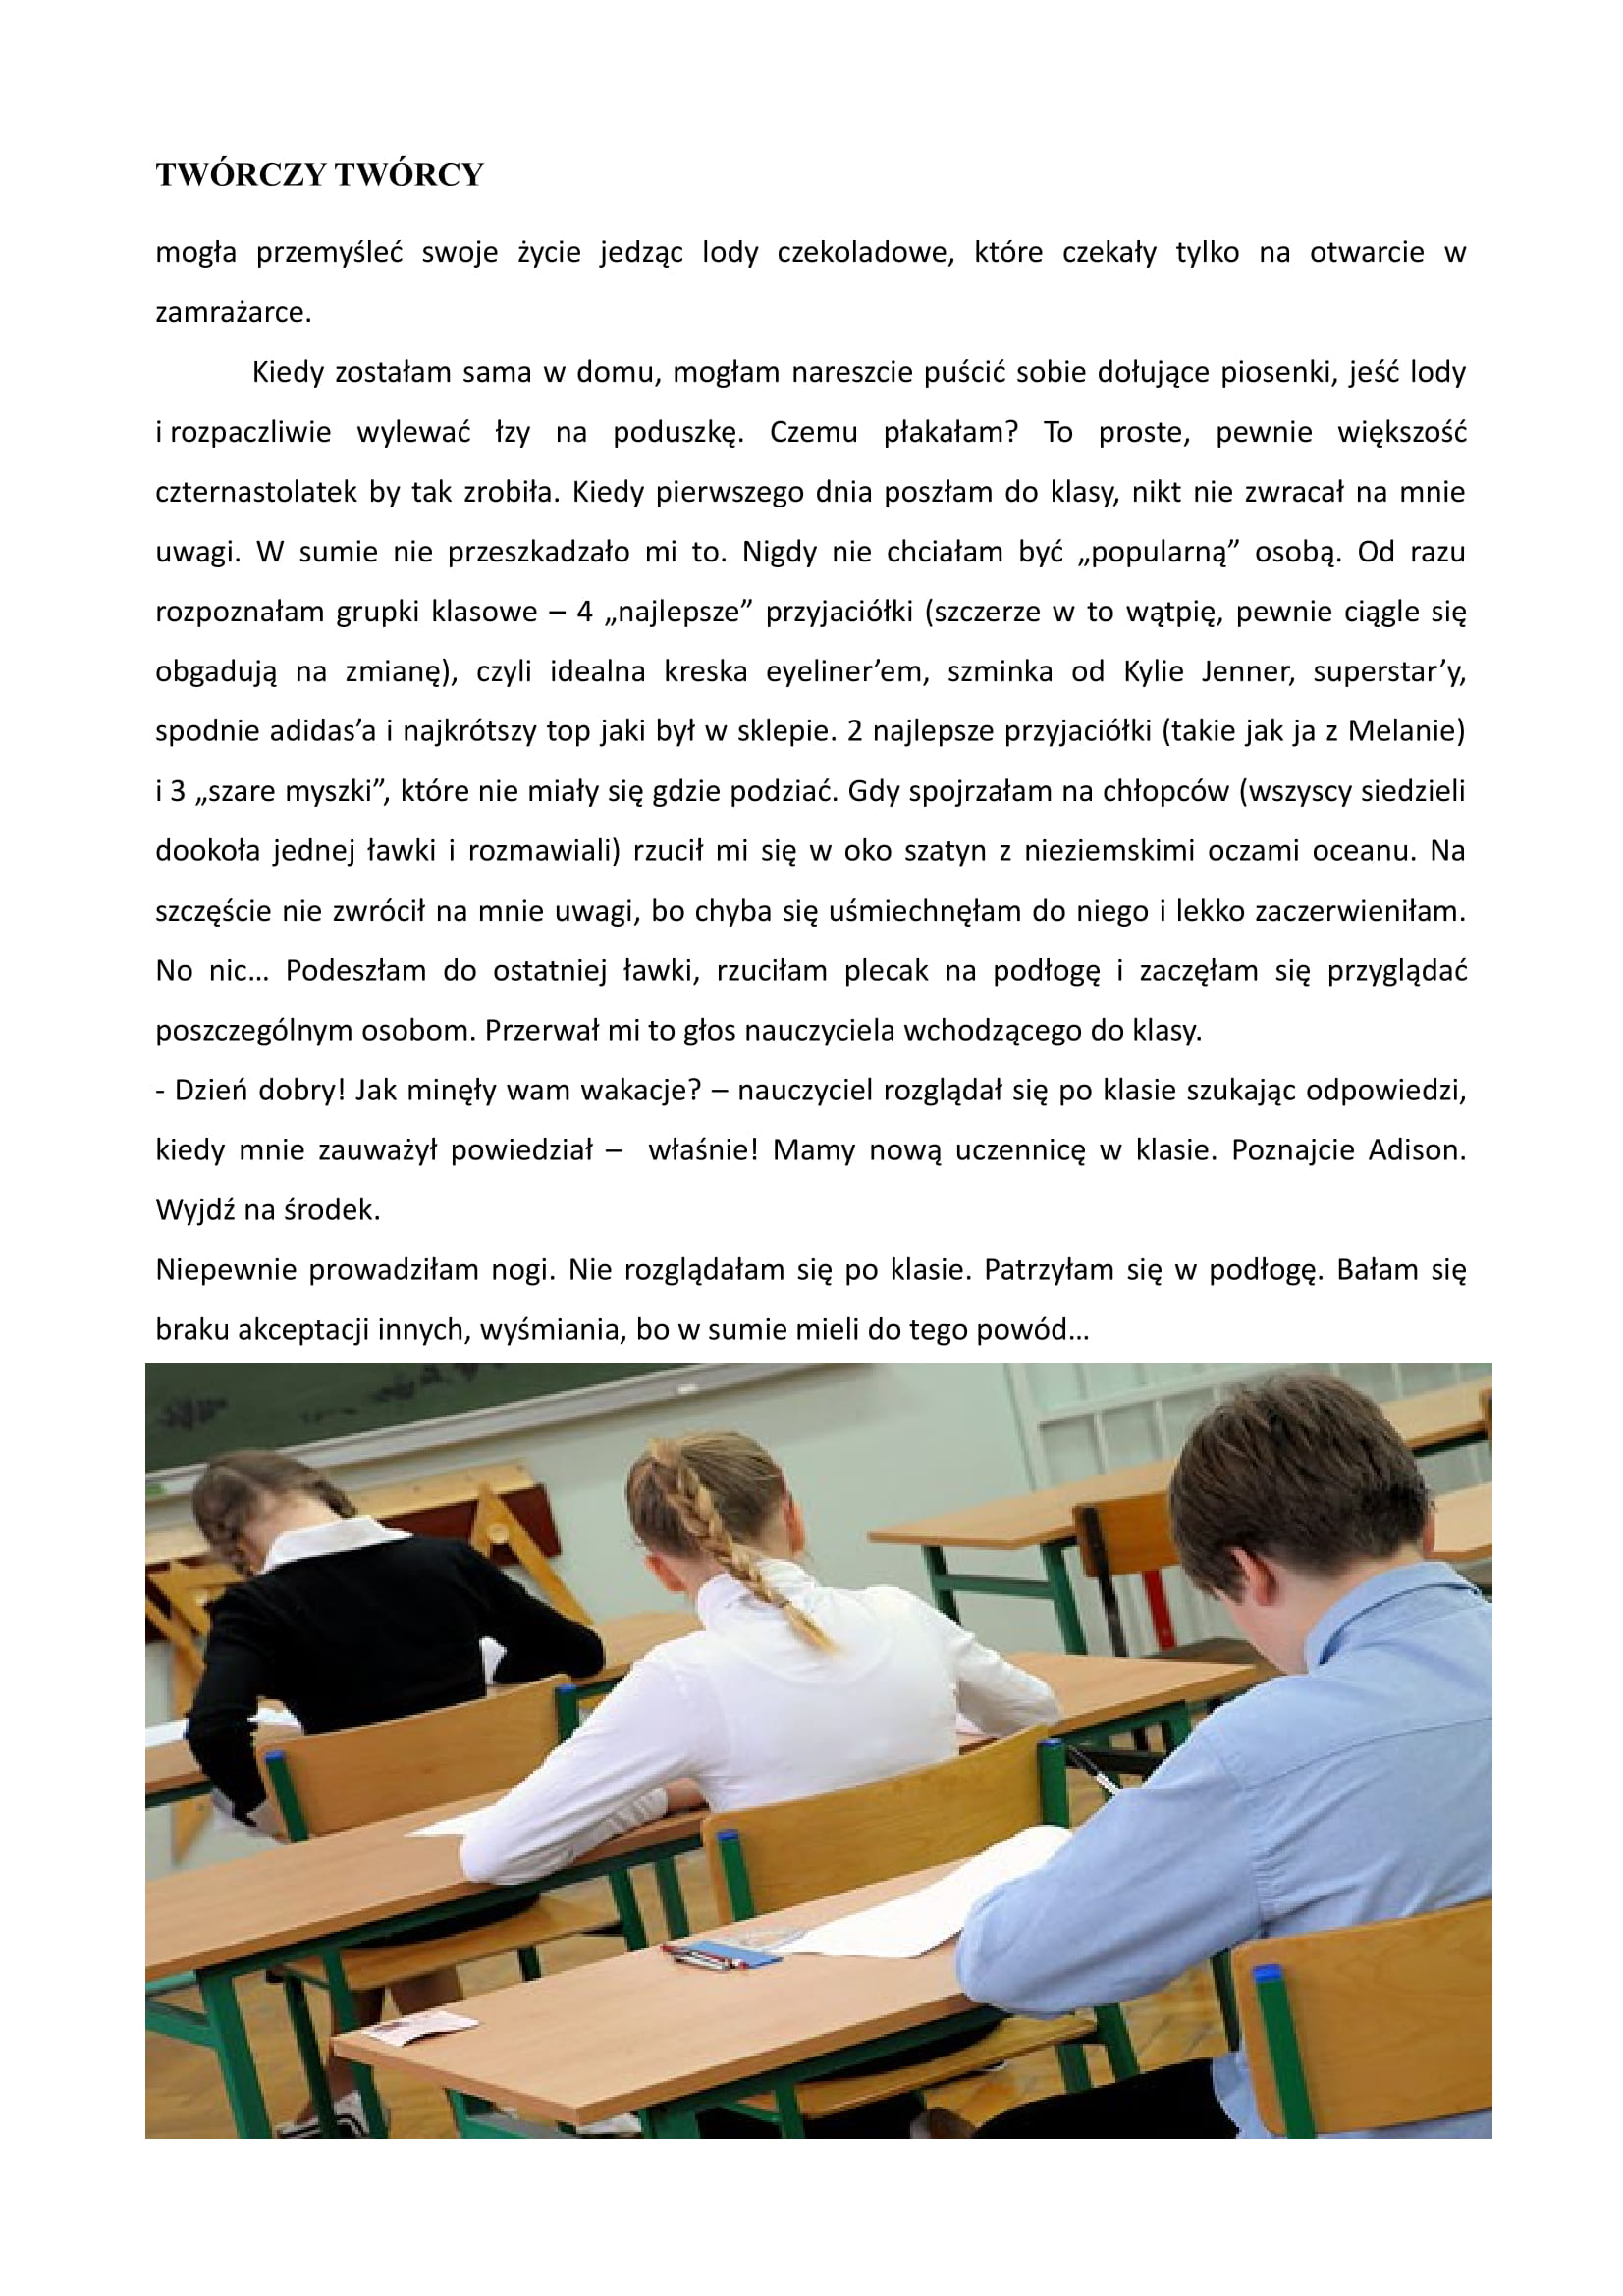 http://sp24sto.edu.pl/wp-content/uploads/sites/3/2018/02/Gazeta-4-2016.2017-16.jpg